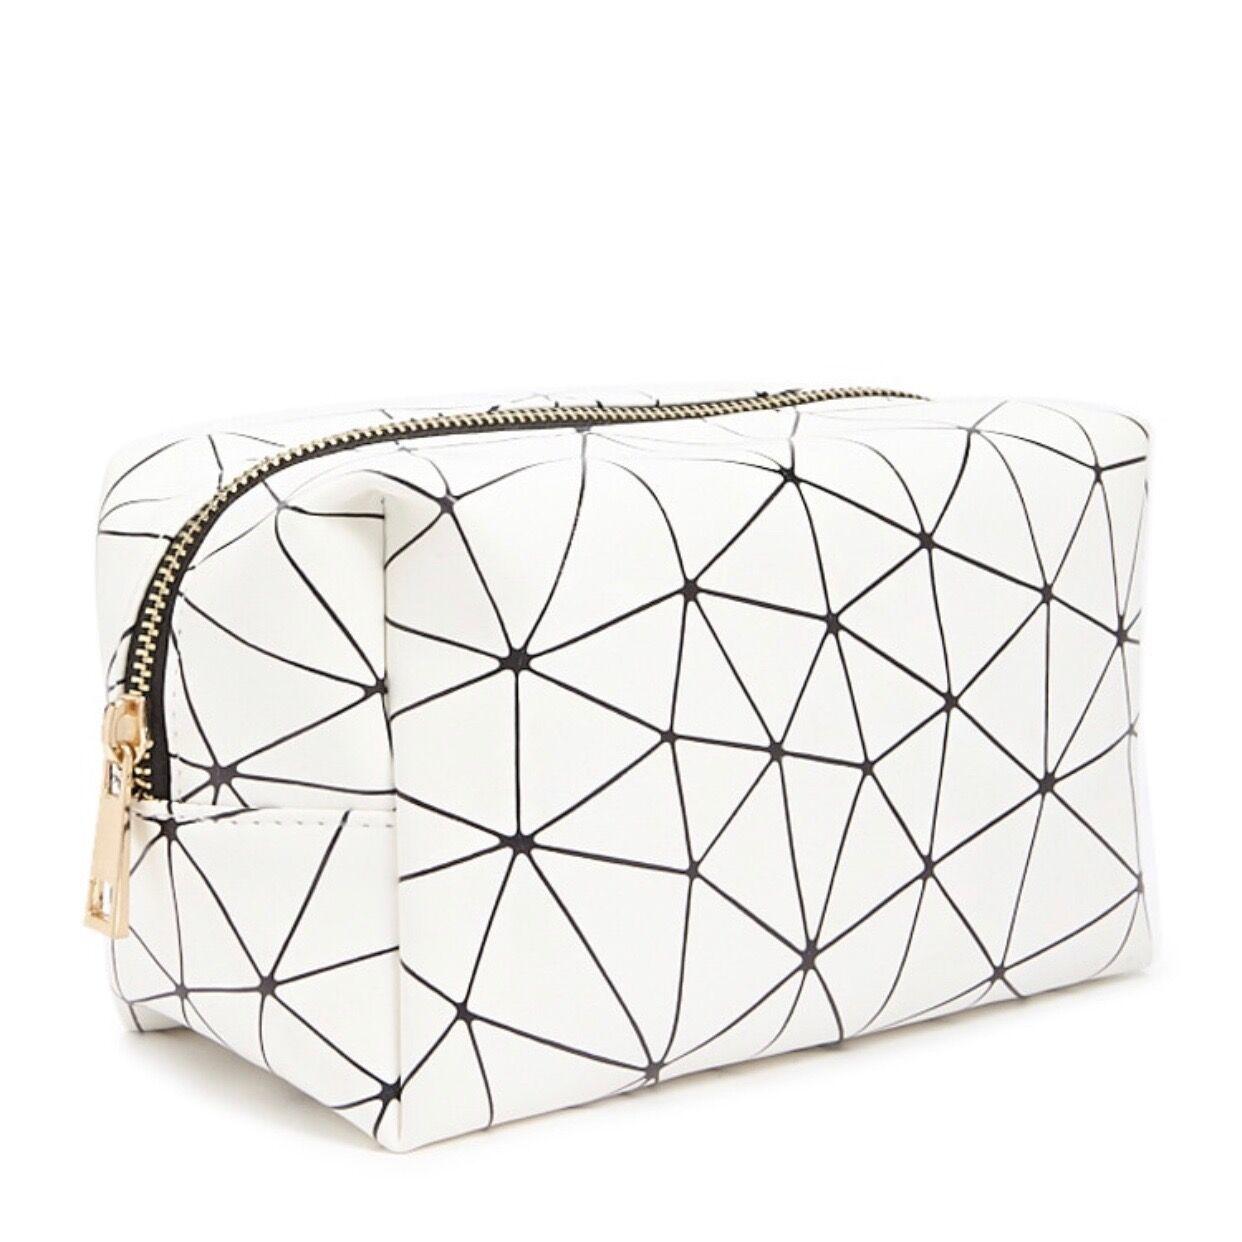 Cosmetic Bag - Yiwu Shiling Bag Co., Ltd.